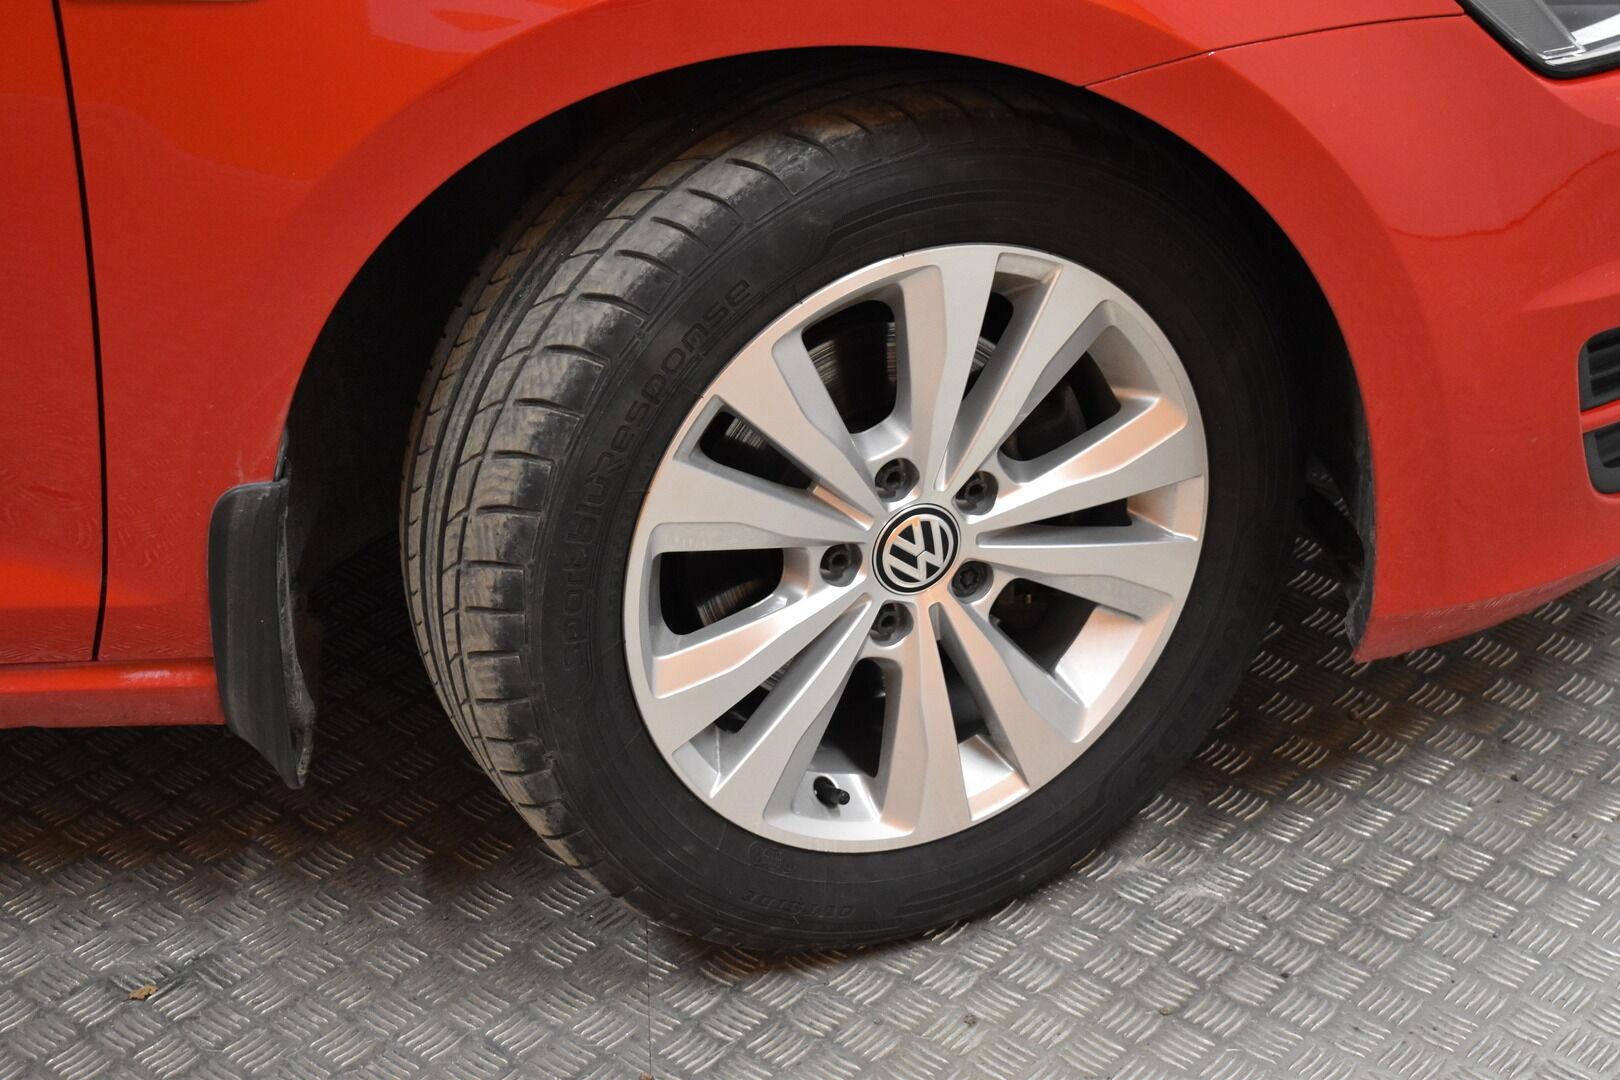 Punainen Farmari, Volkswagen Golf – LEM-79340, kuva 24